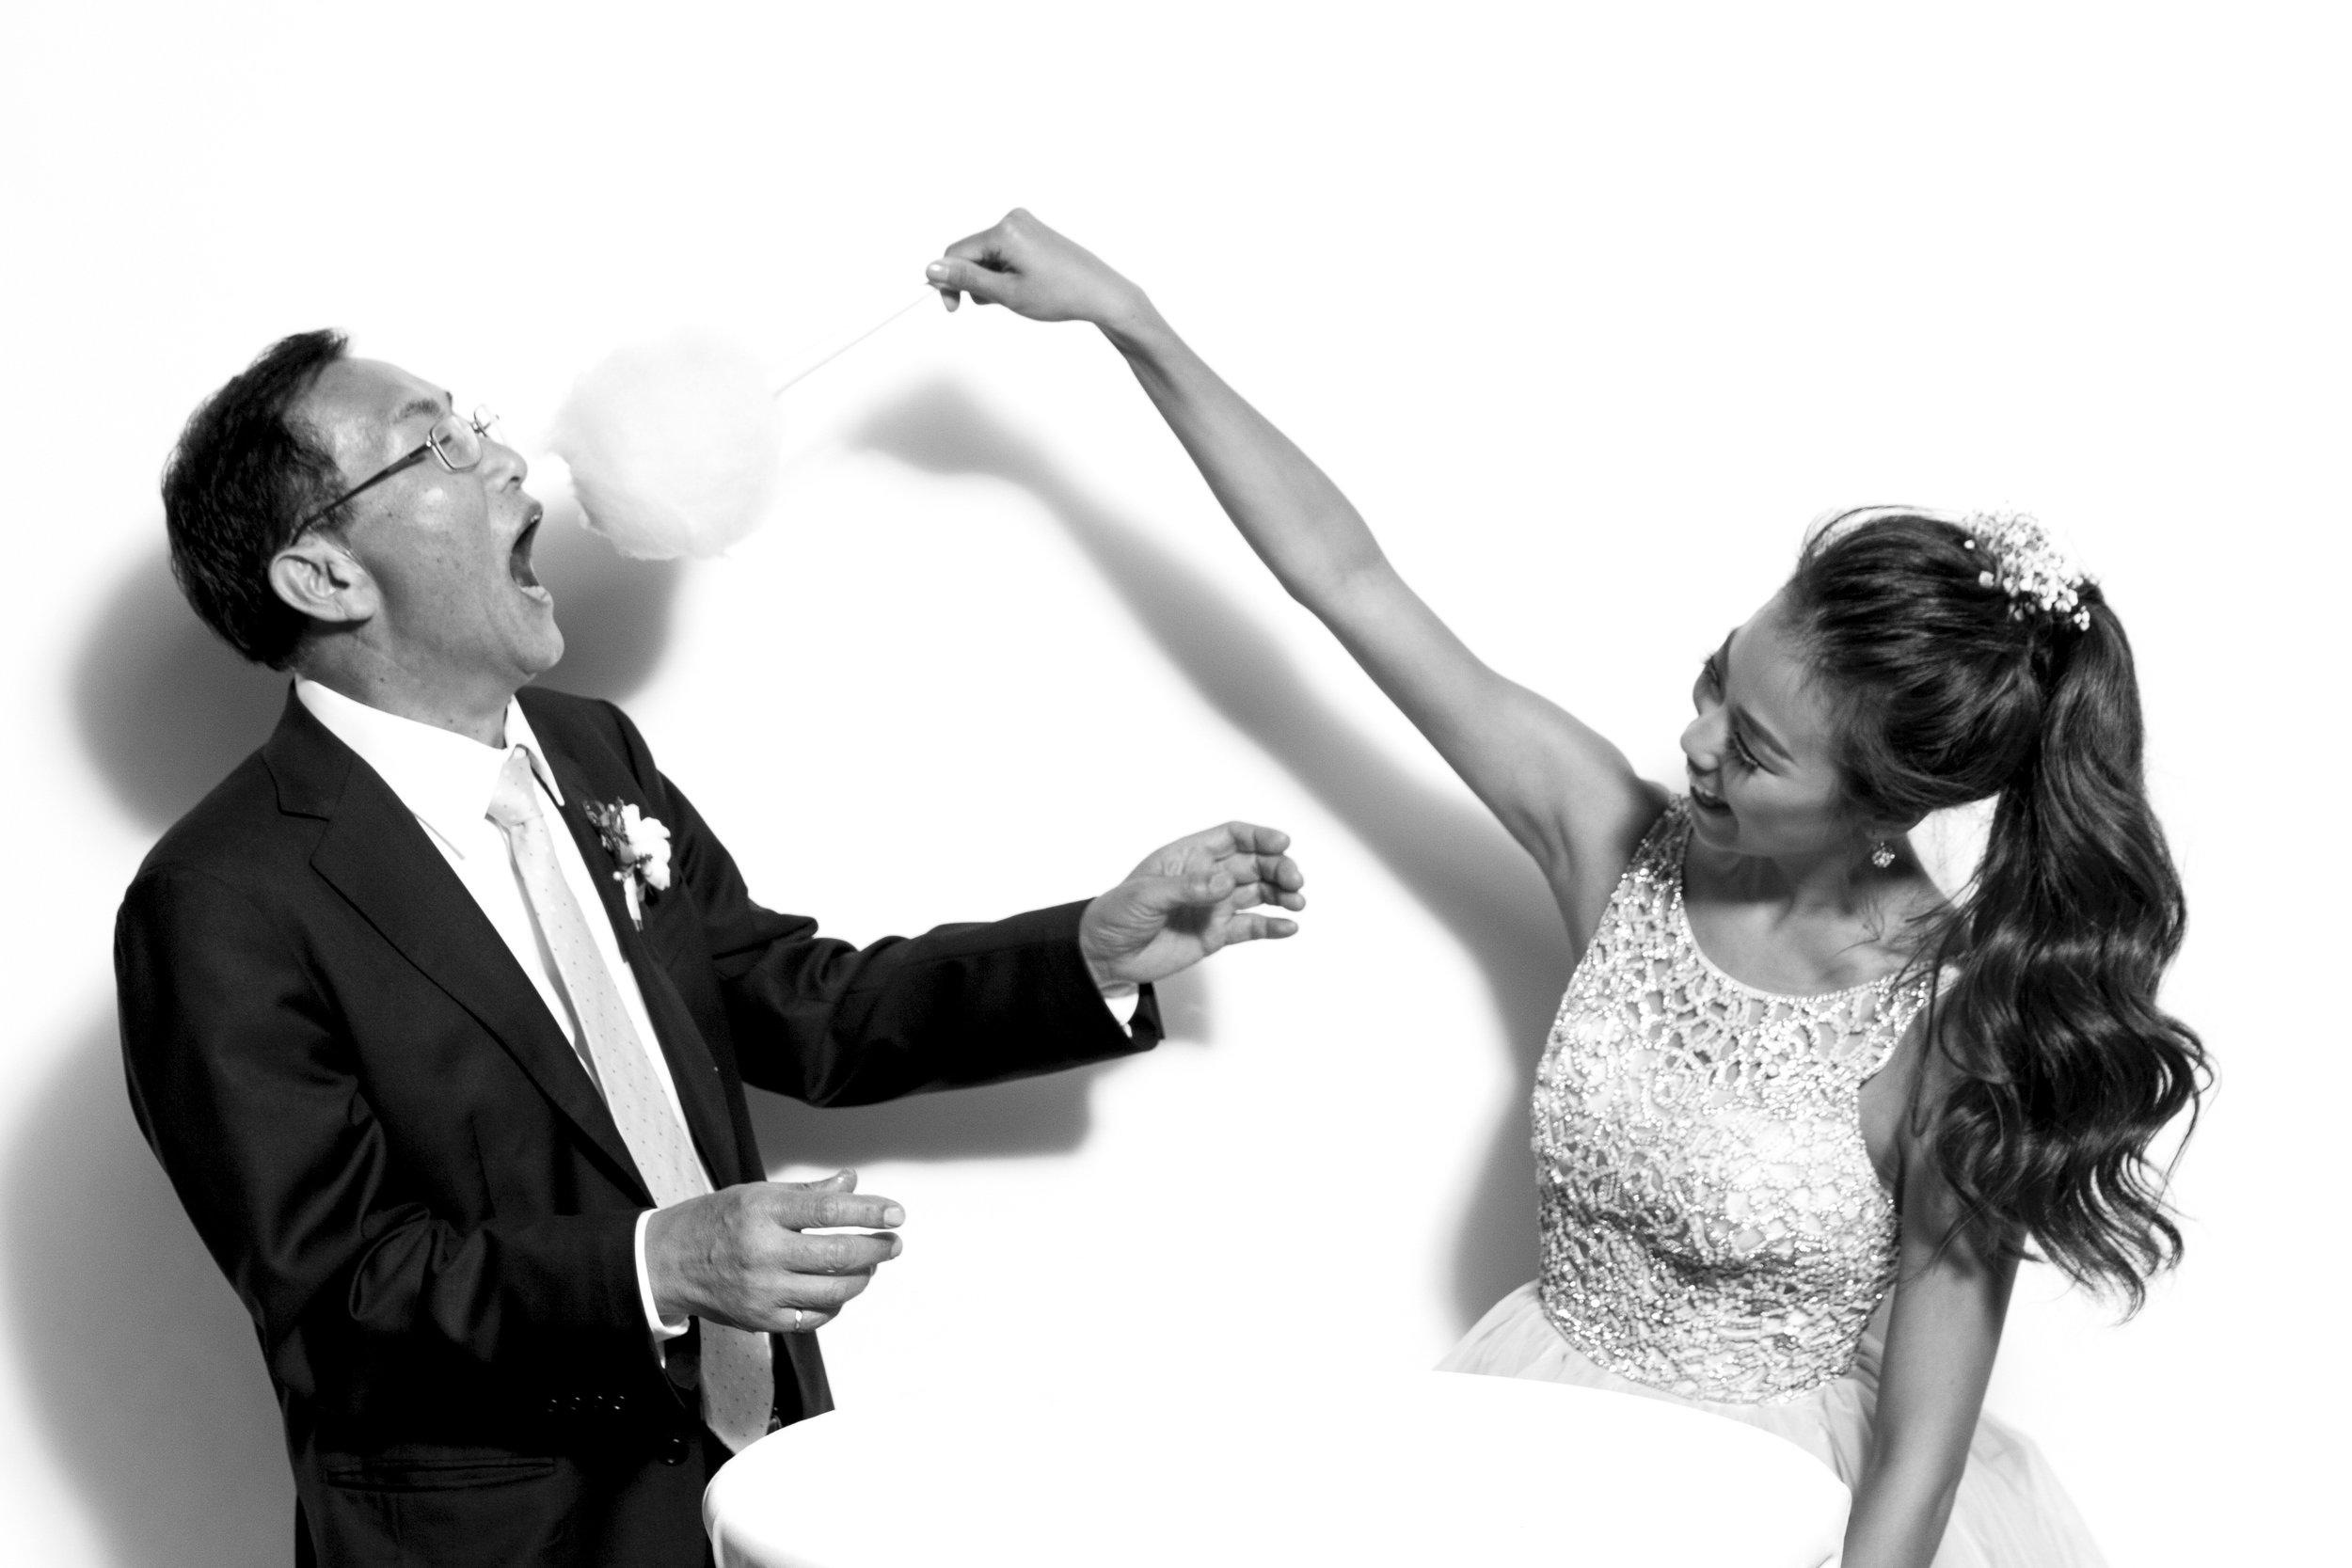 5ive15ifteen-515-Toronto-Wedding-Photographer-Portrait Booth-3.jpg